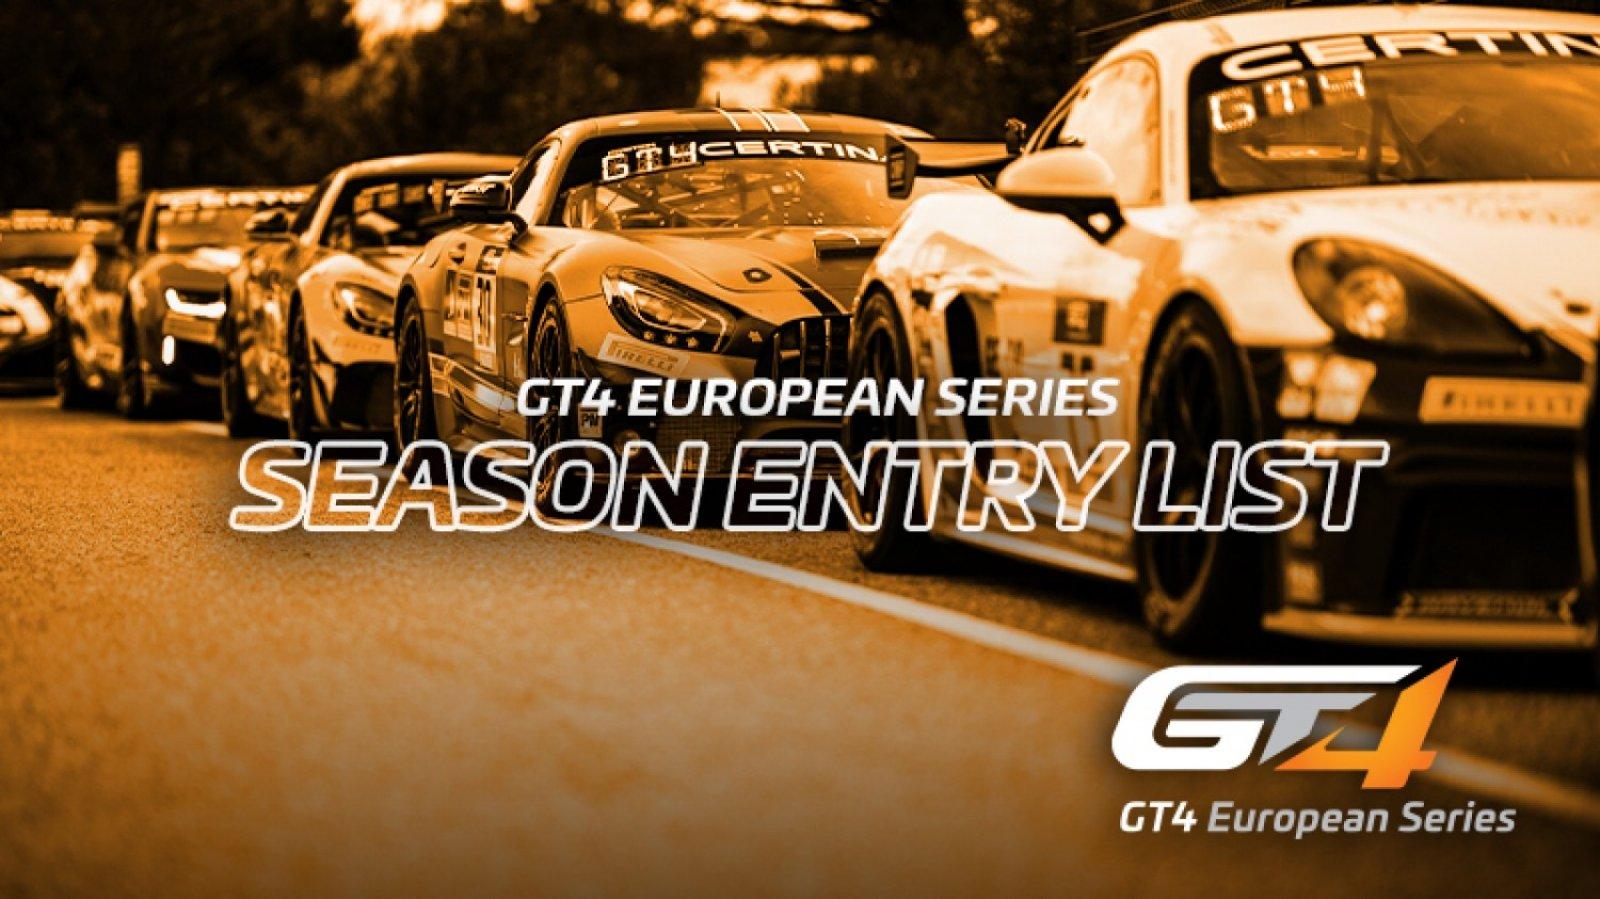 Major growth for GT4 European Series with 37-car full-season entry list